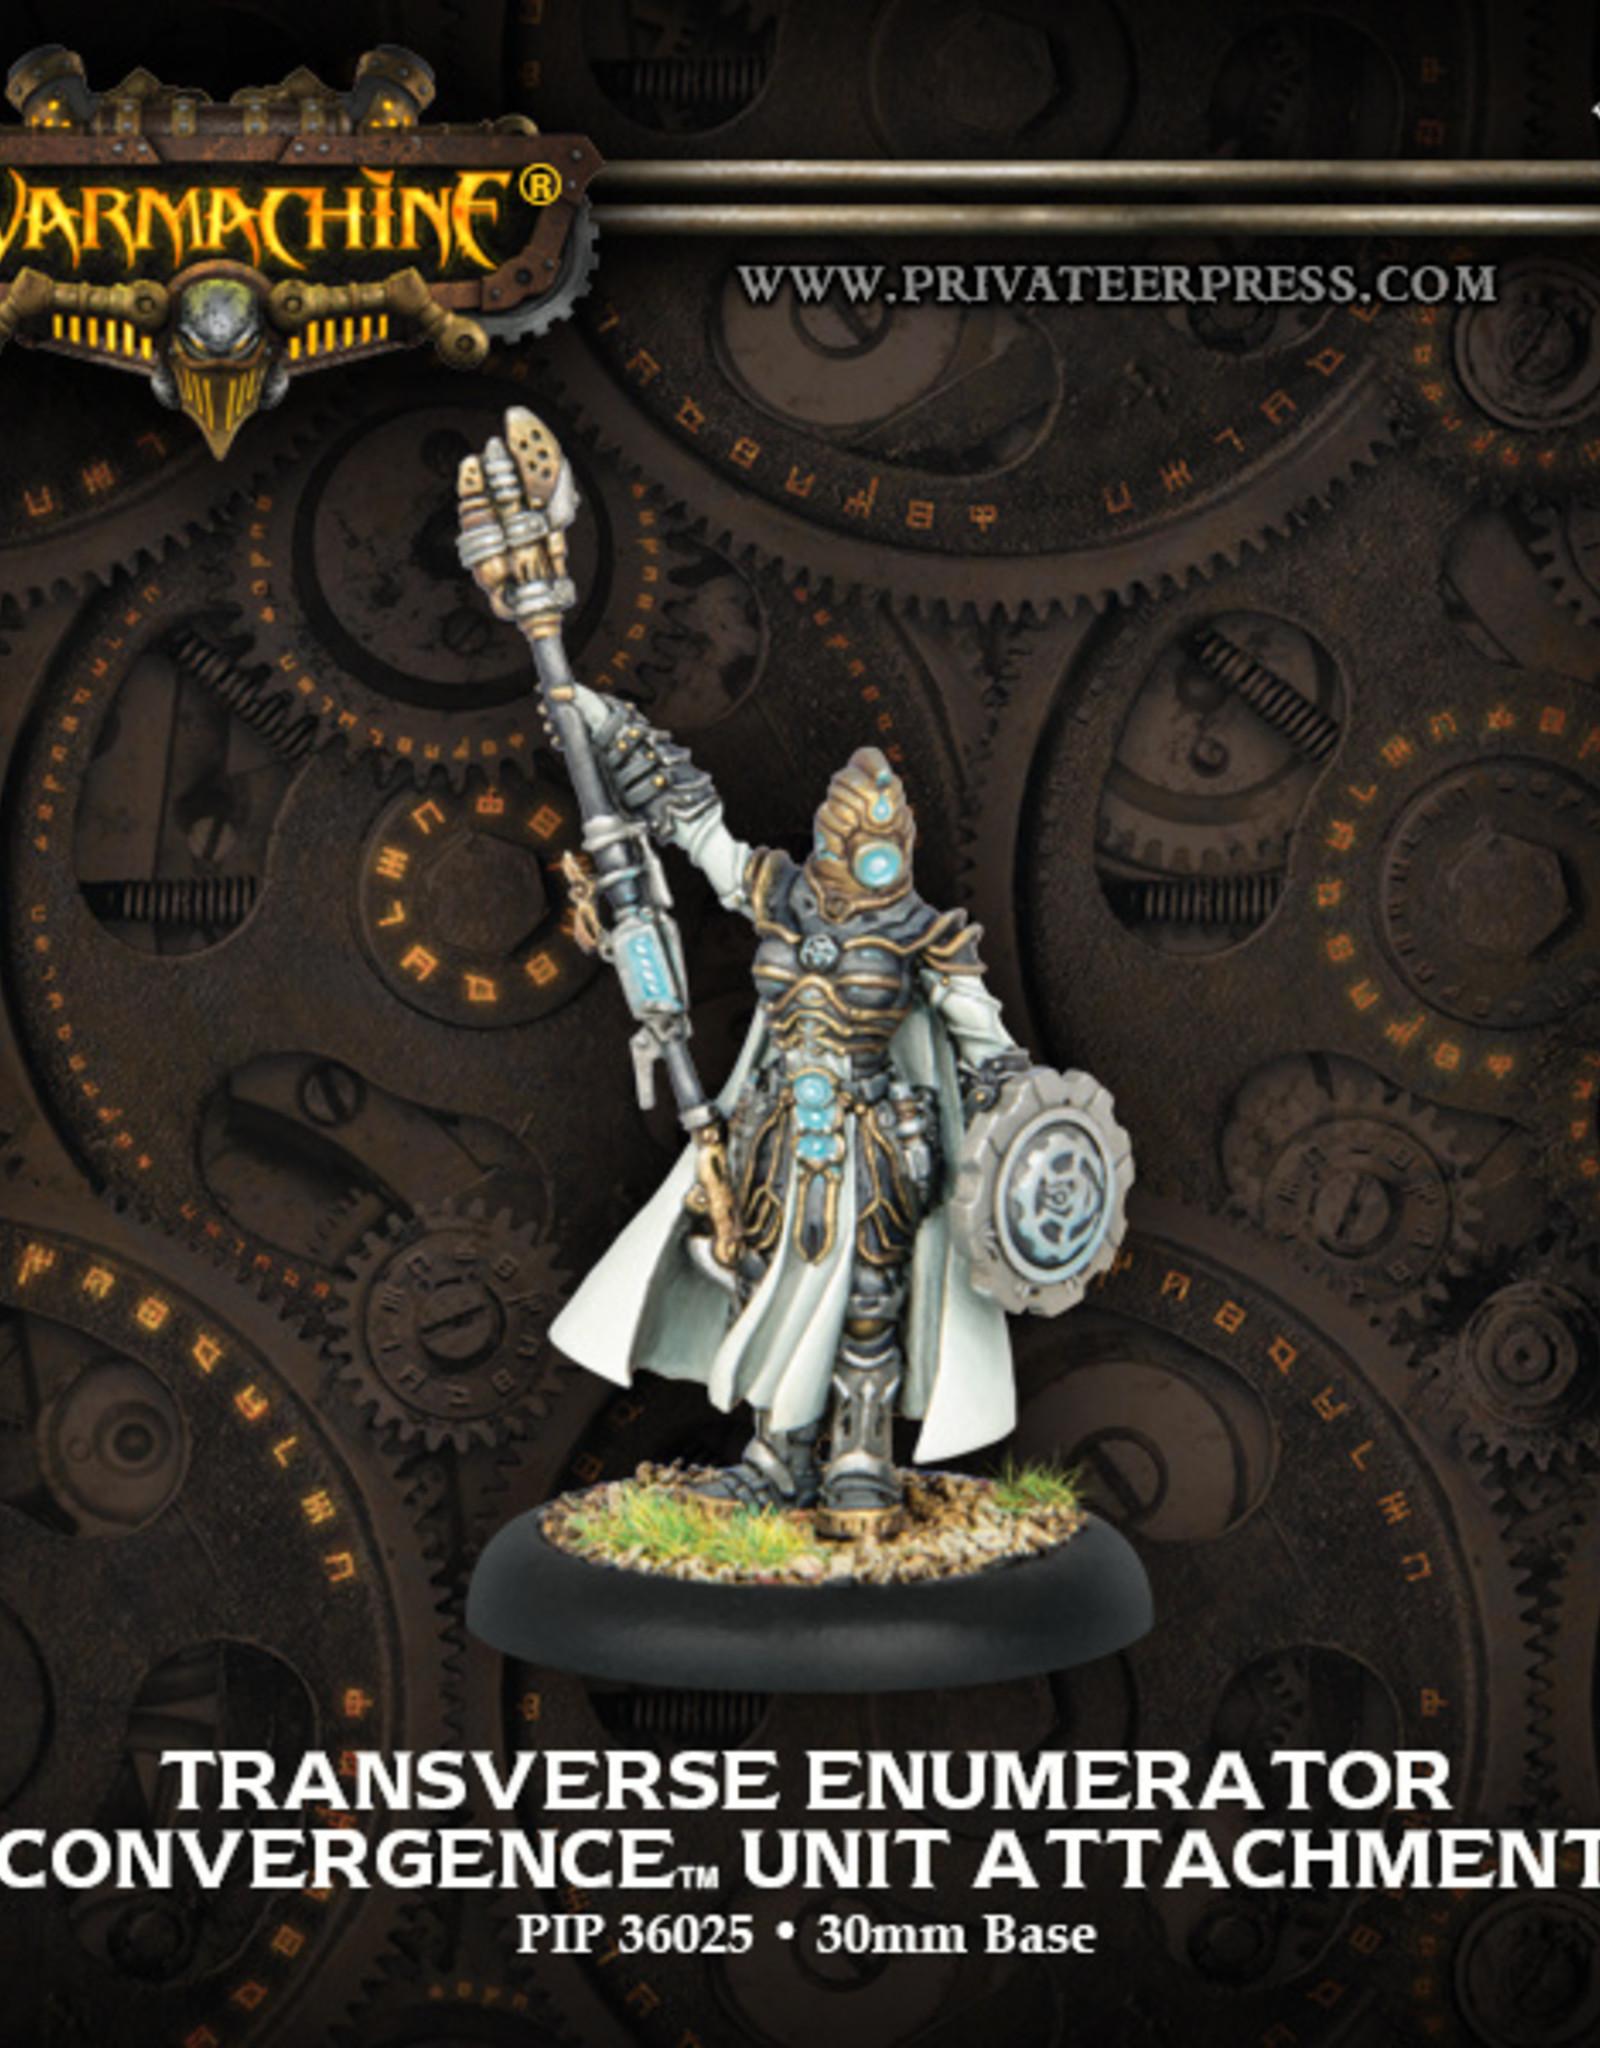 Privateer Press Transverse Enumerator